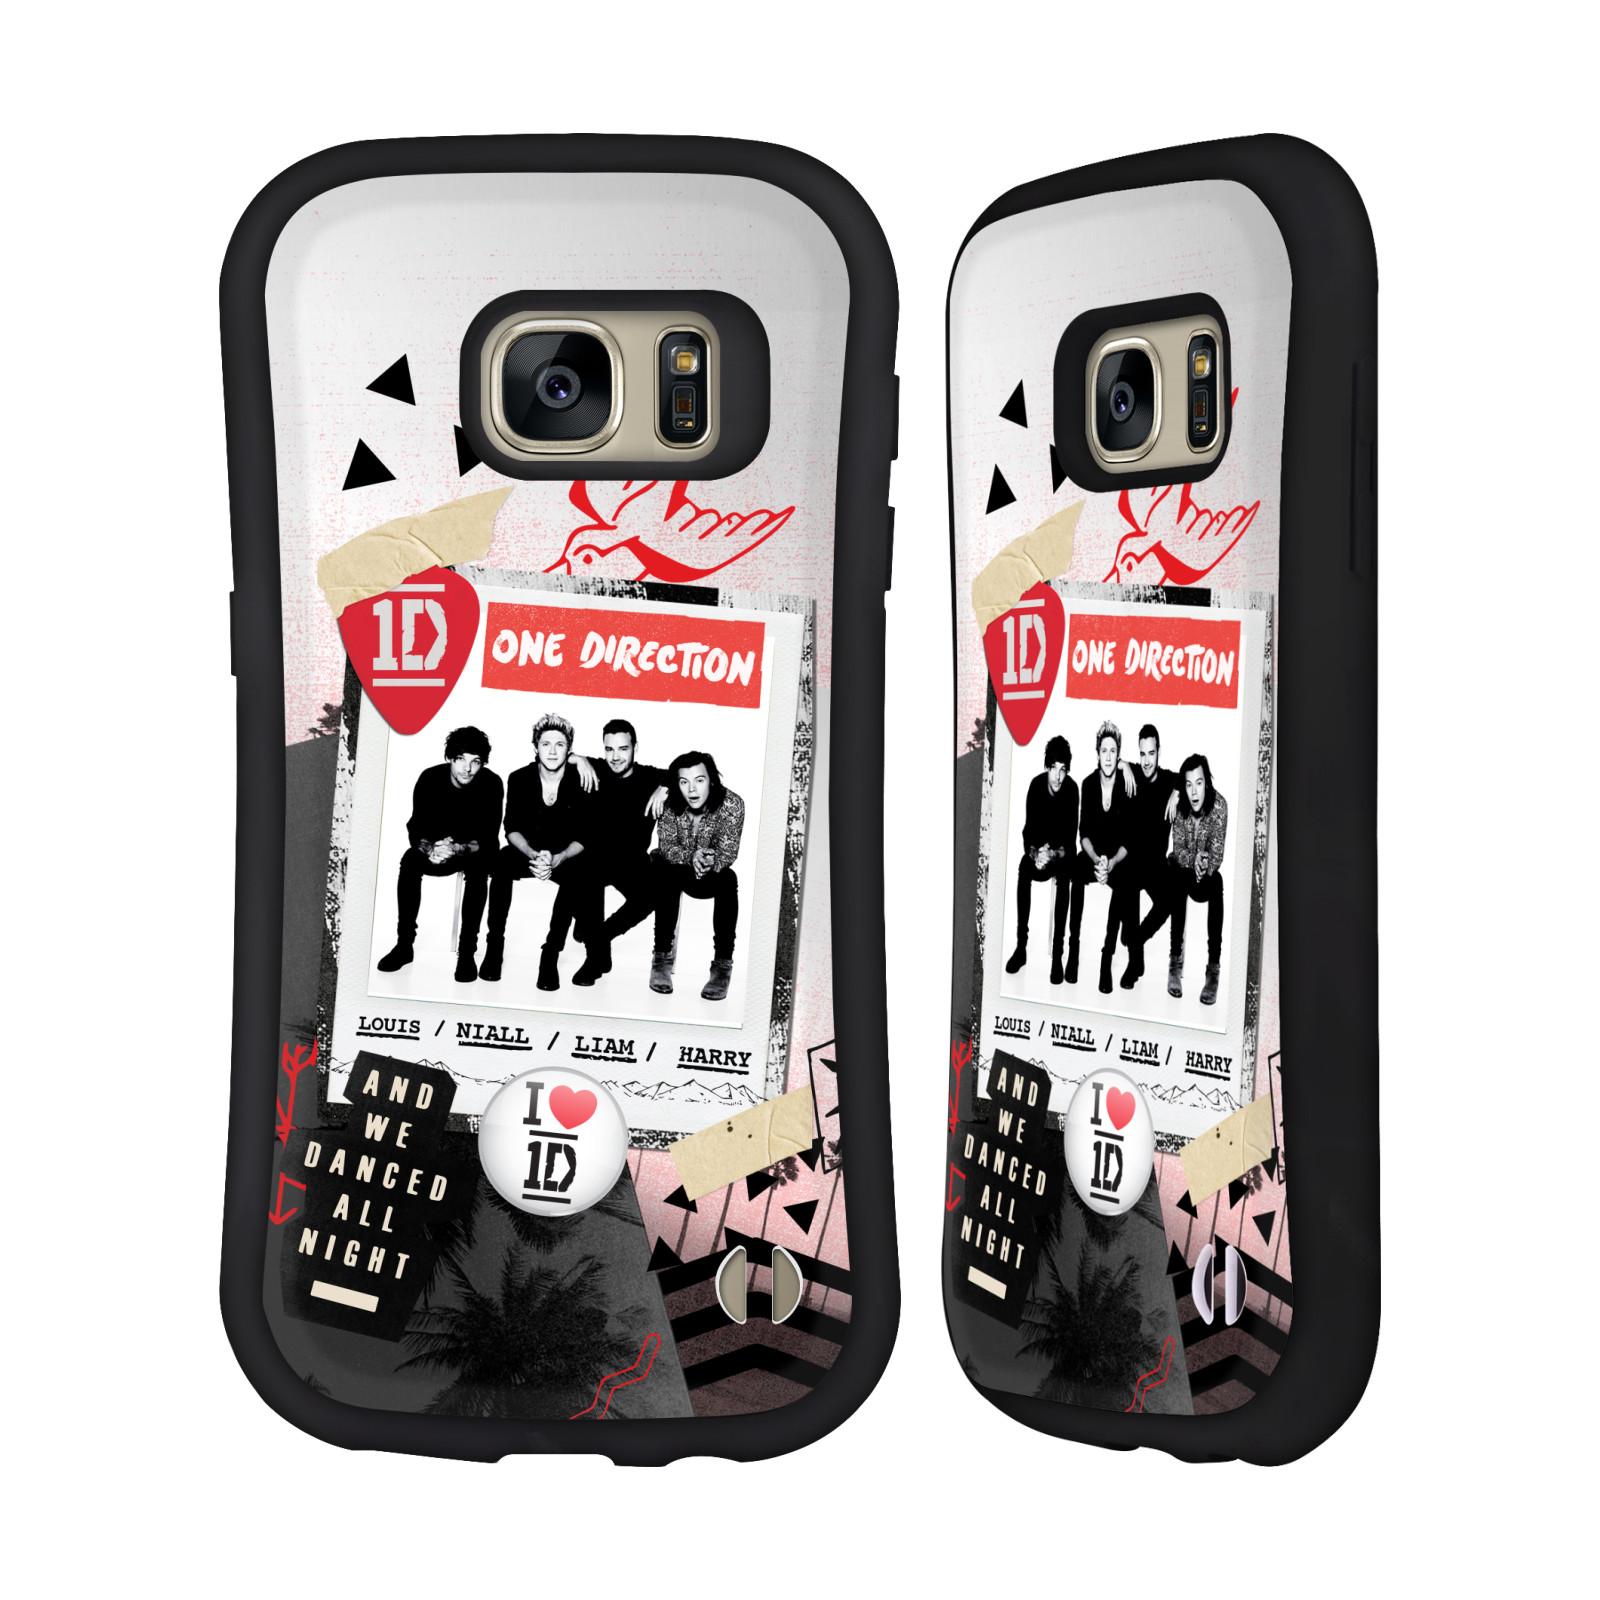 OFFICIAL ONE DIRECTION LOCKER ART GROUP HYBRID CASE FOR SAMSUNG PHONES